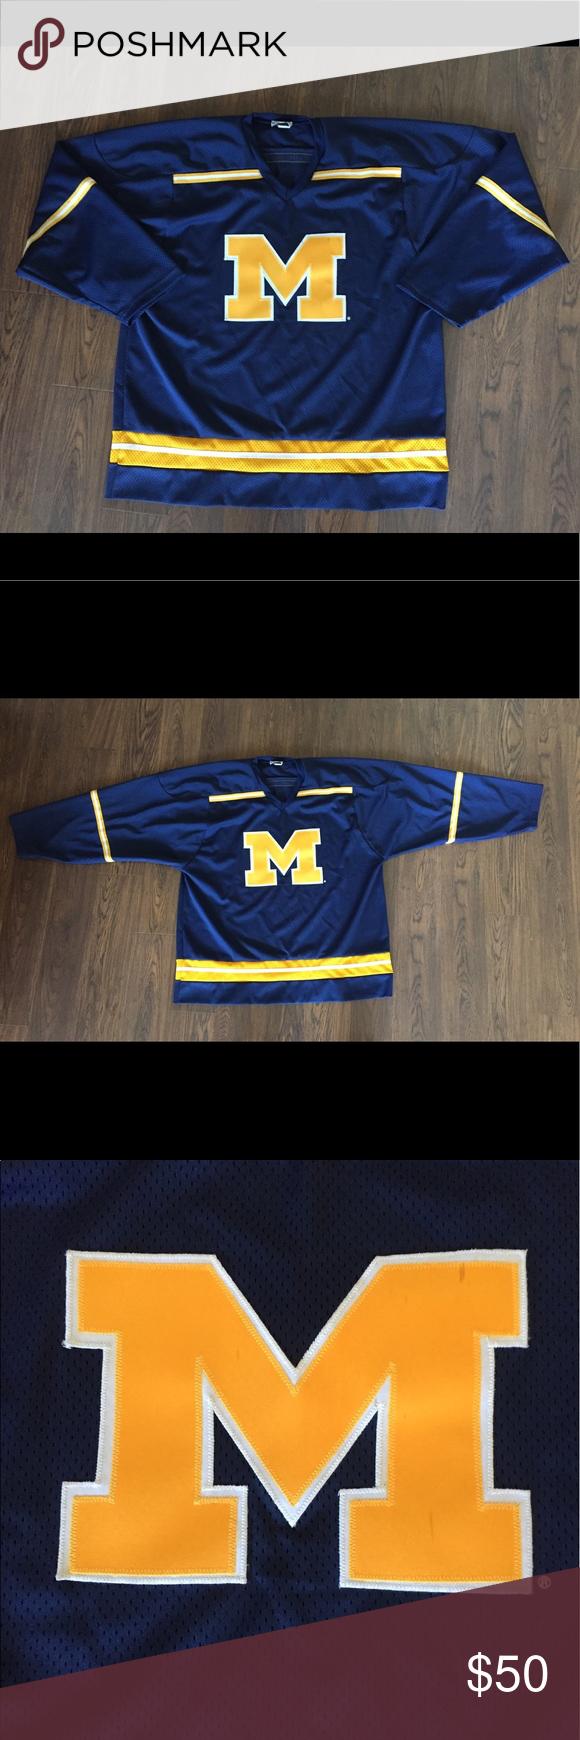 Vintage Koronis Michigan Wolverines Hockey Jersey Hockey Jersey Michigan Wolverines Hockey Michigan Wolverines